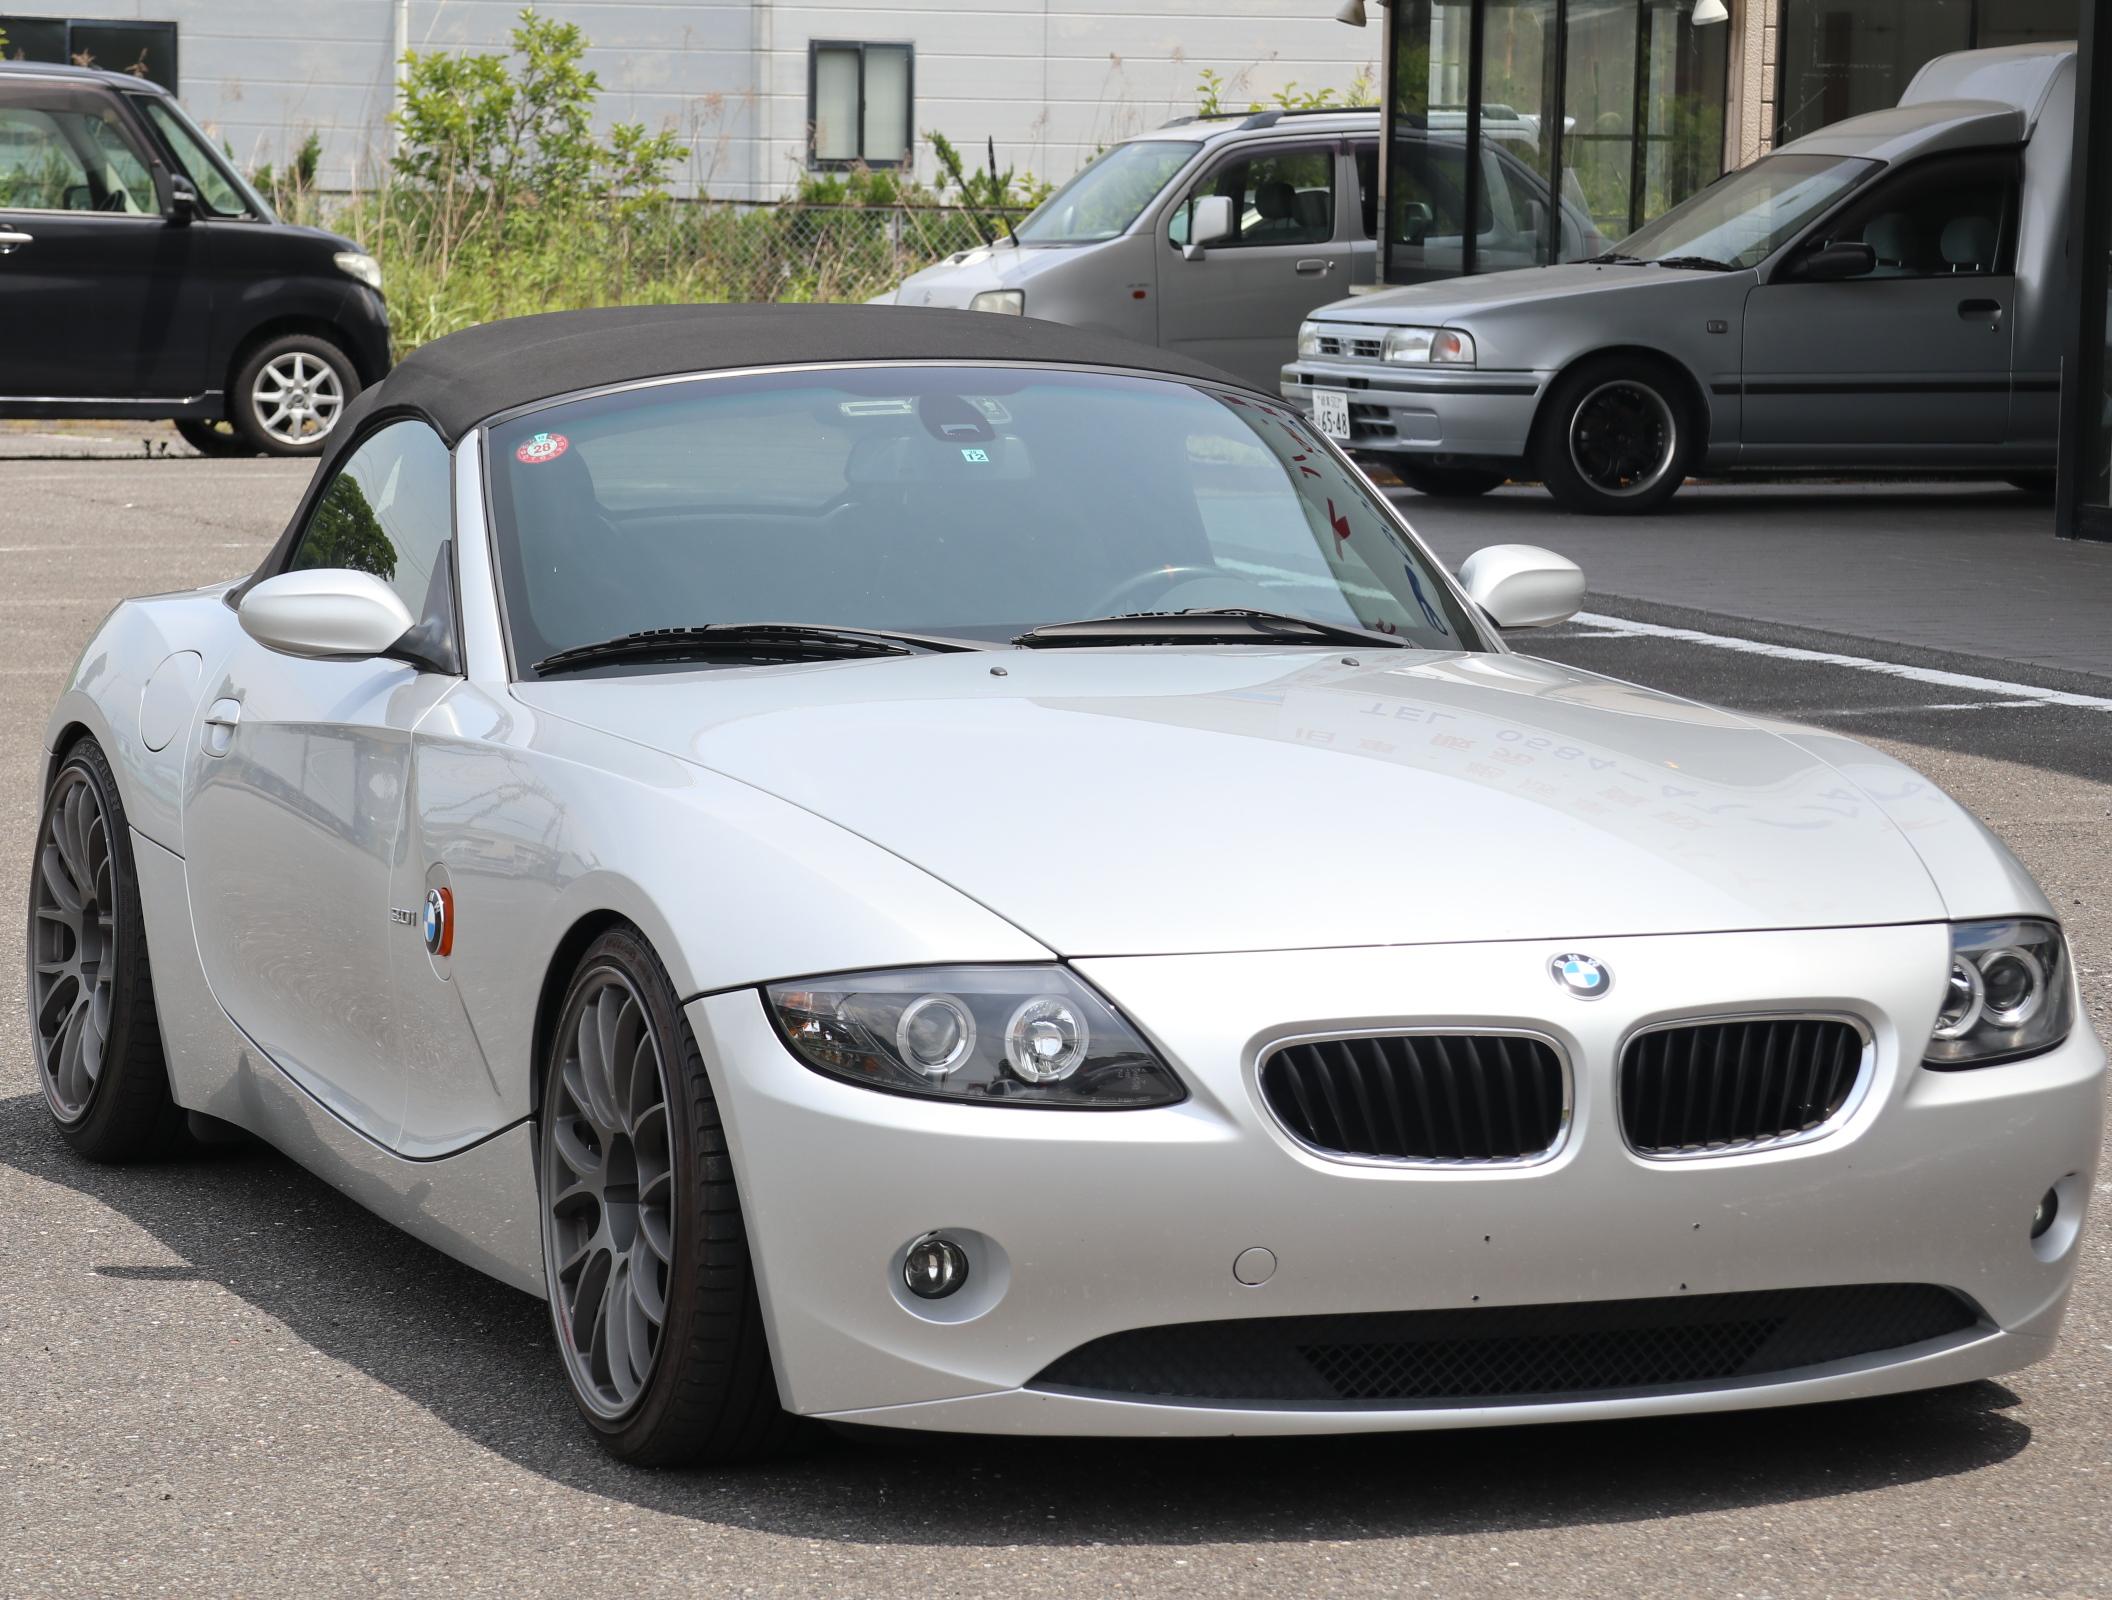 BMW Z4 3.0i SMG シルバー